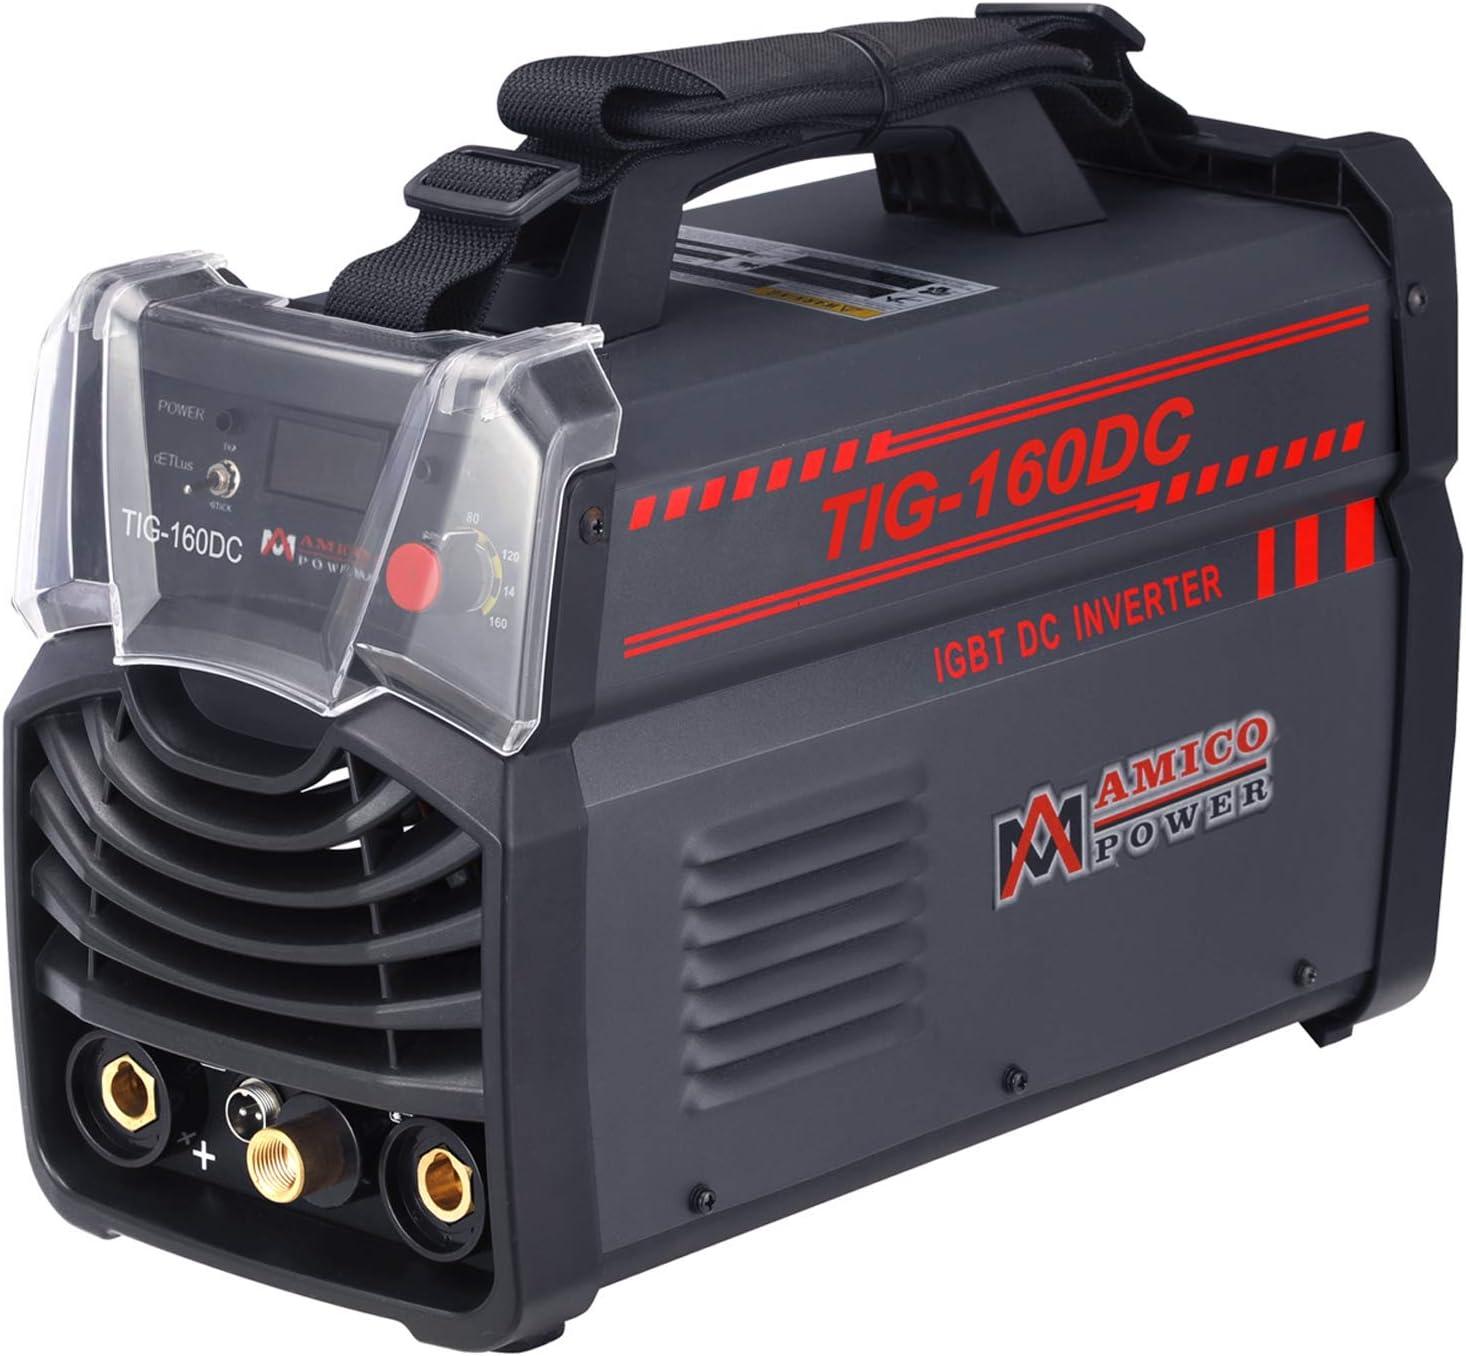 AMICO POWER TIG 160DC TIG